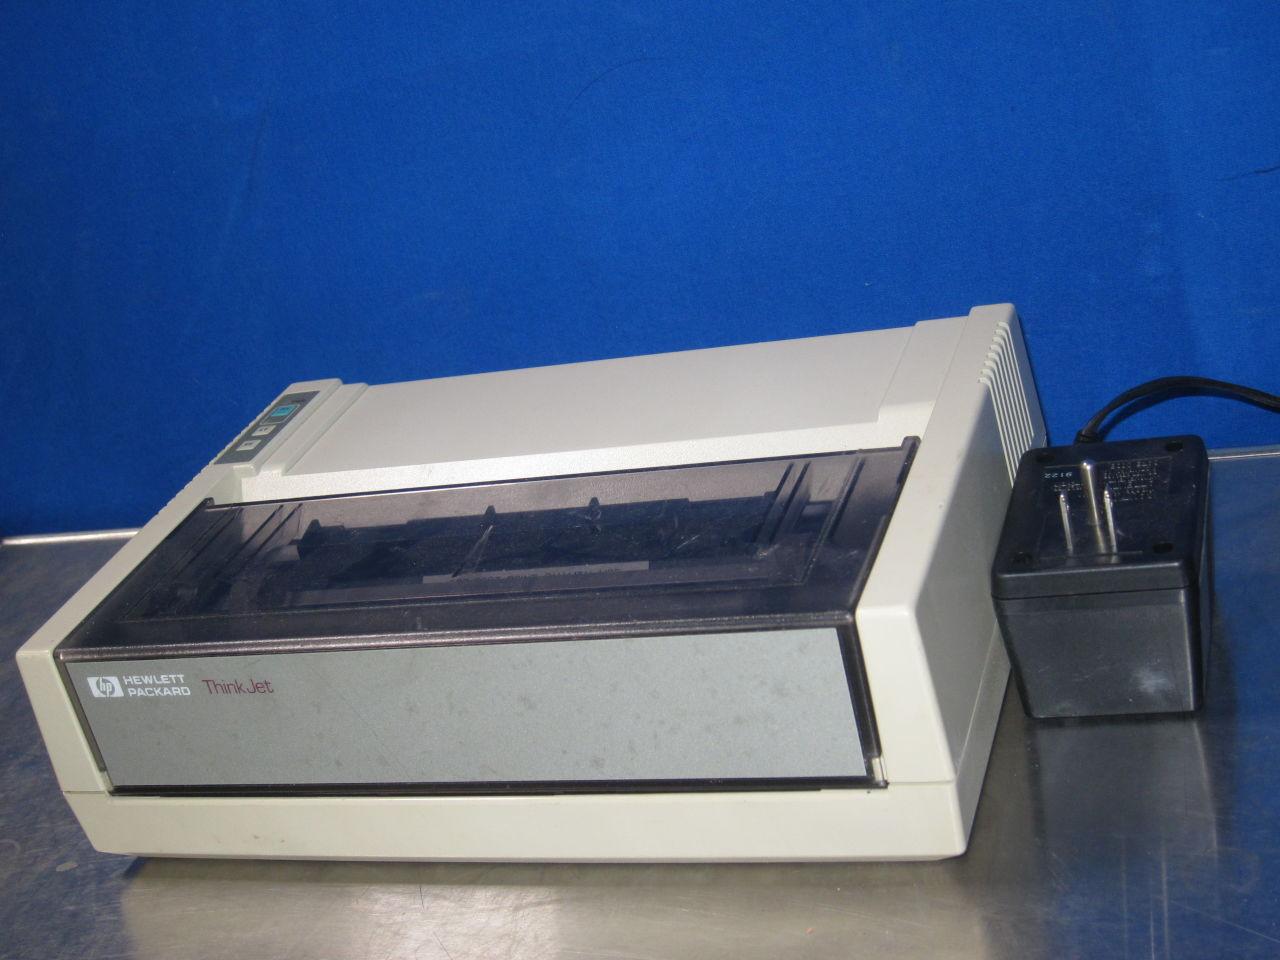 KODAK ESP 7250  - Lot of 2 Printer